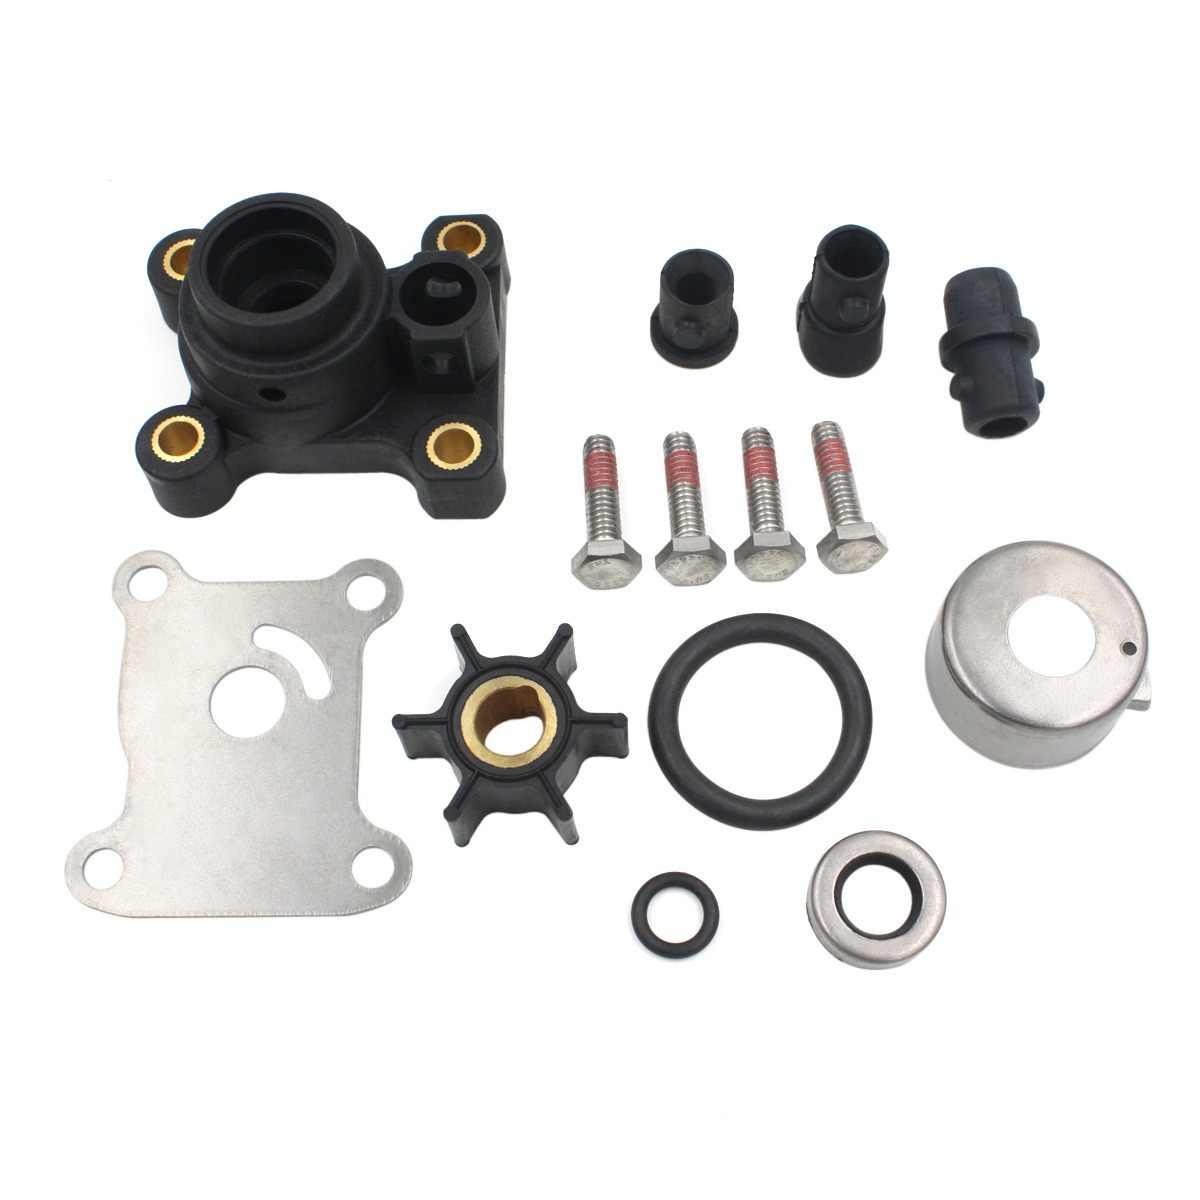 hight resolution of 9 9hp 15hp impeller water pump repair kit for johnson evinrude 394711 0394711 391698